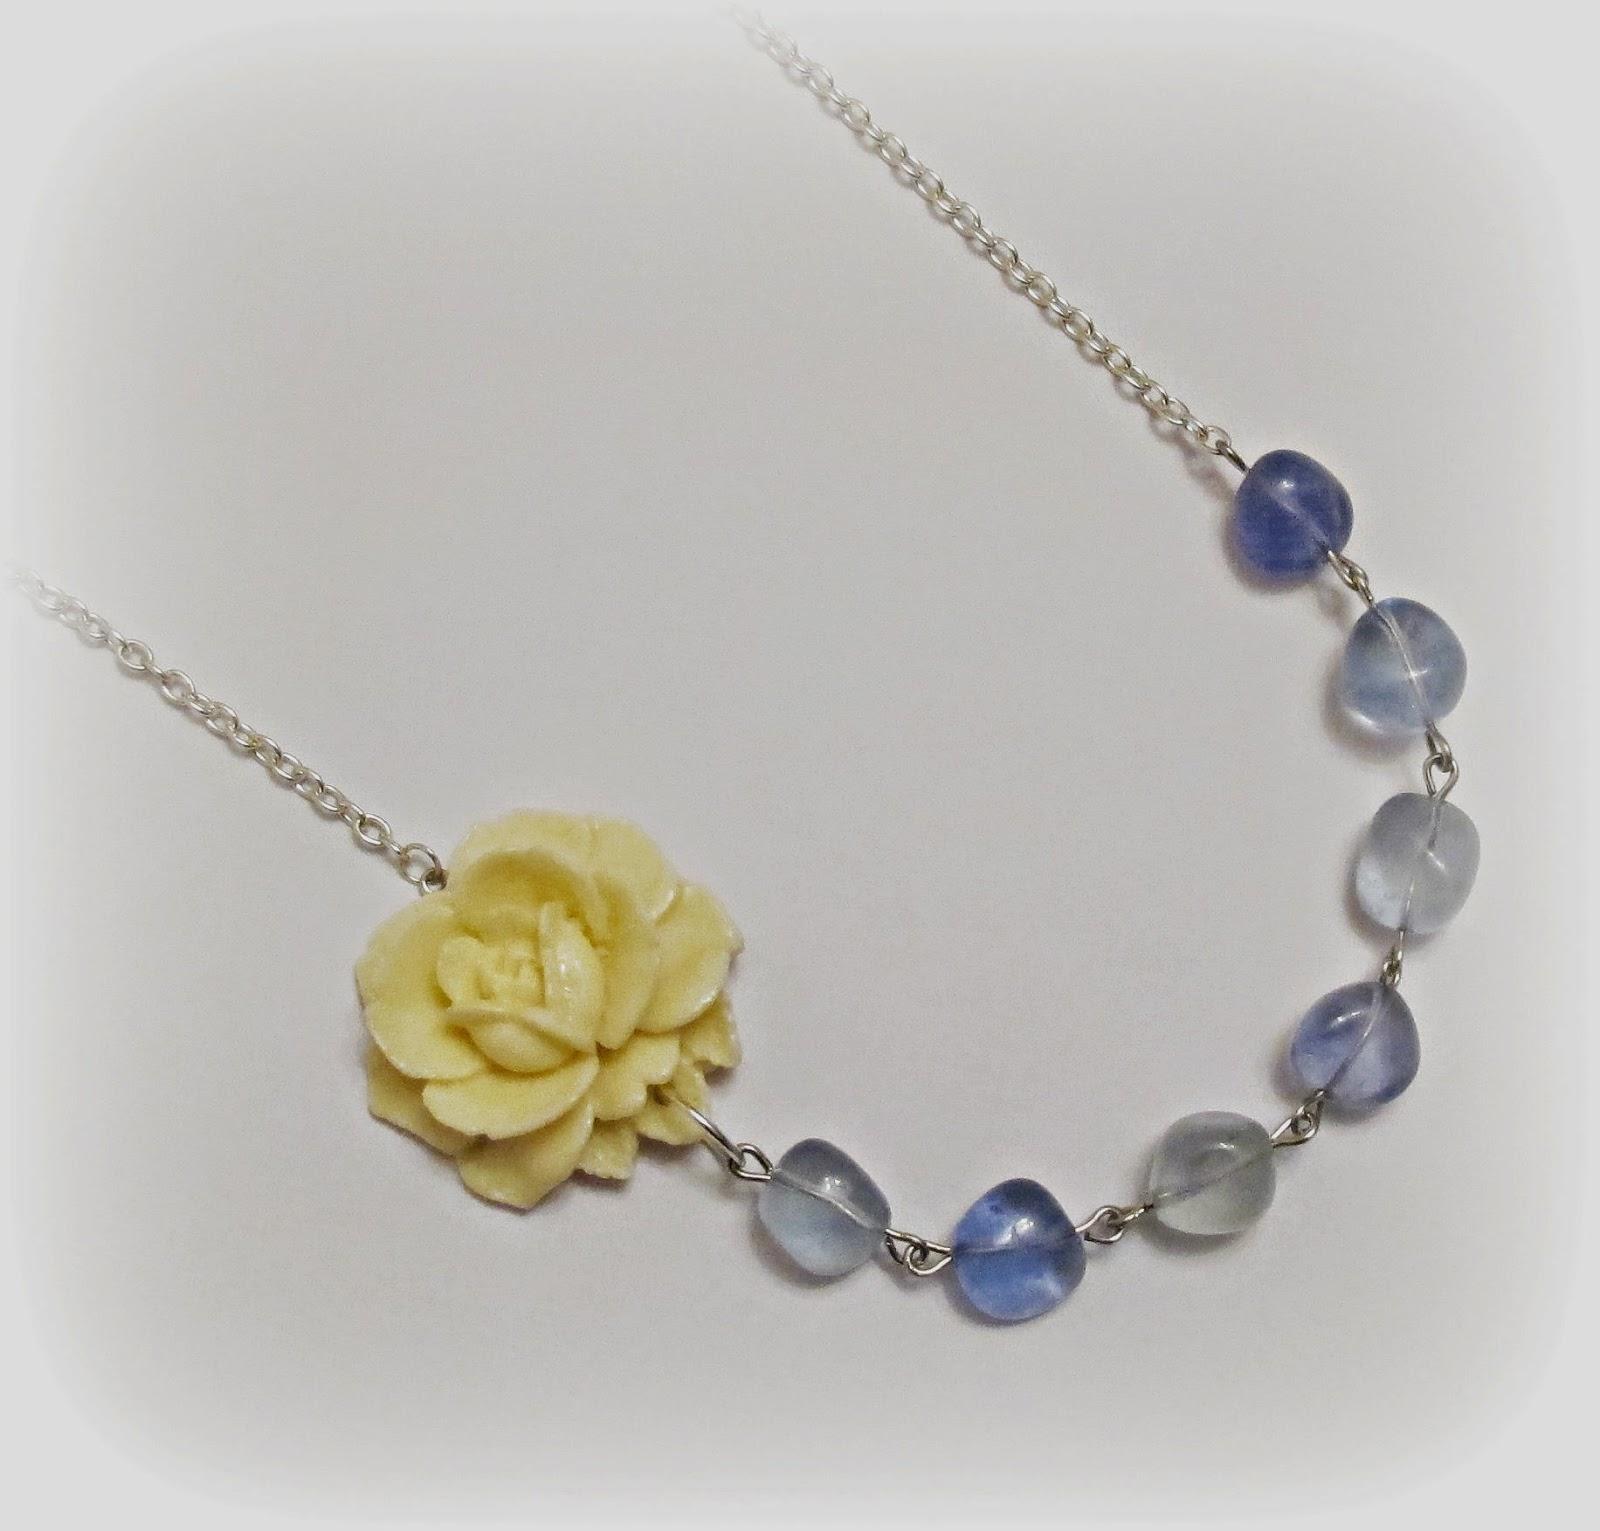 image asymmetrical necklace yavanna rose cream blue stone agate two cheeky monkeys